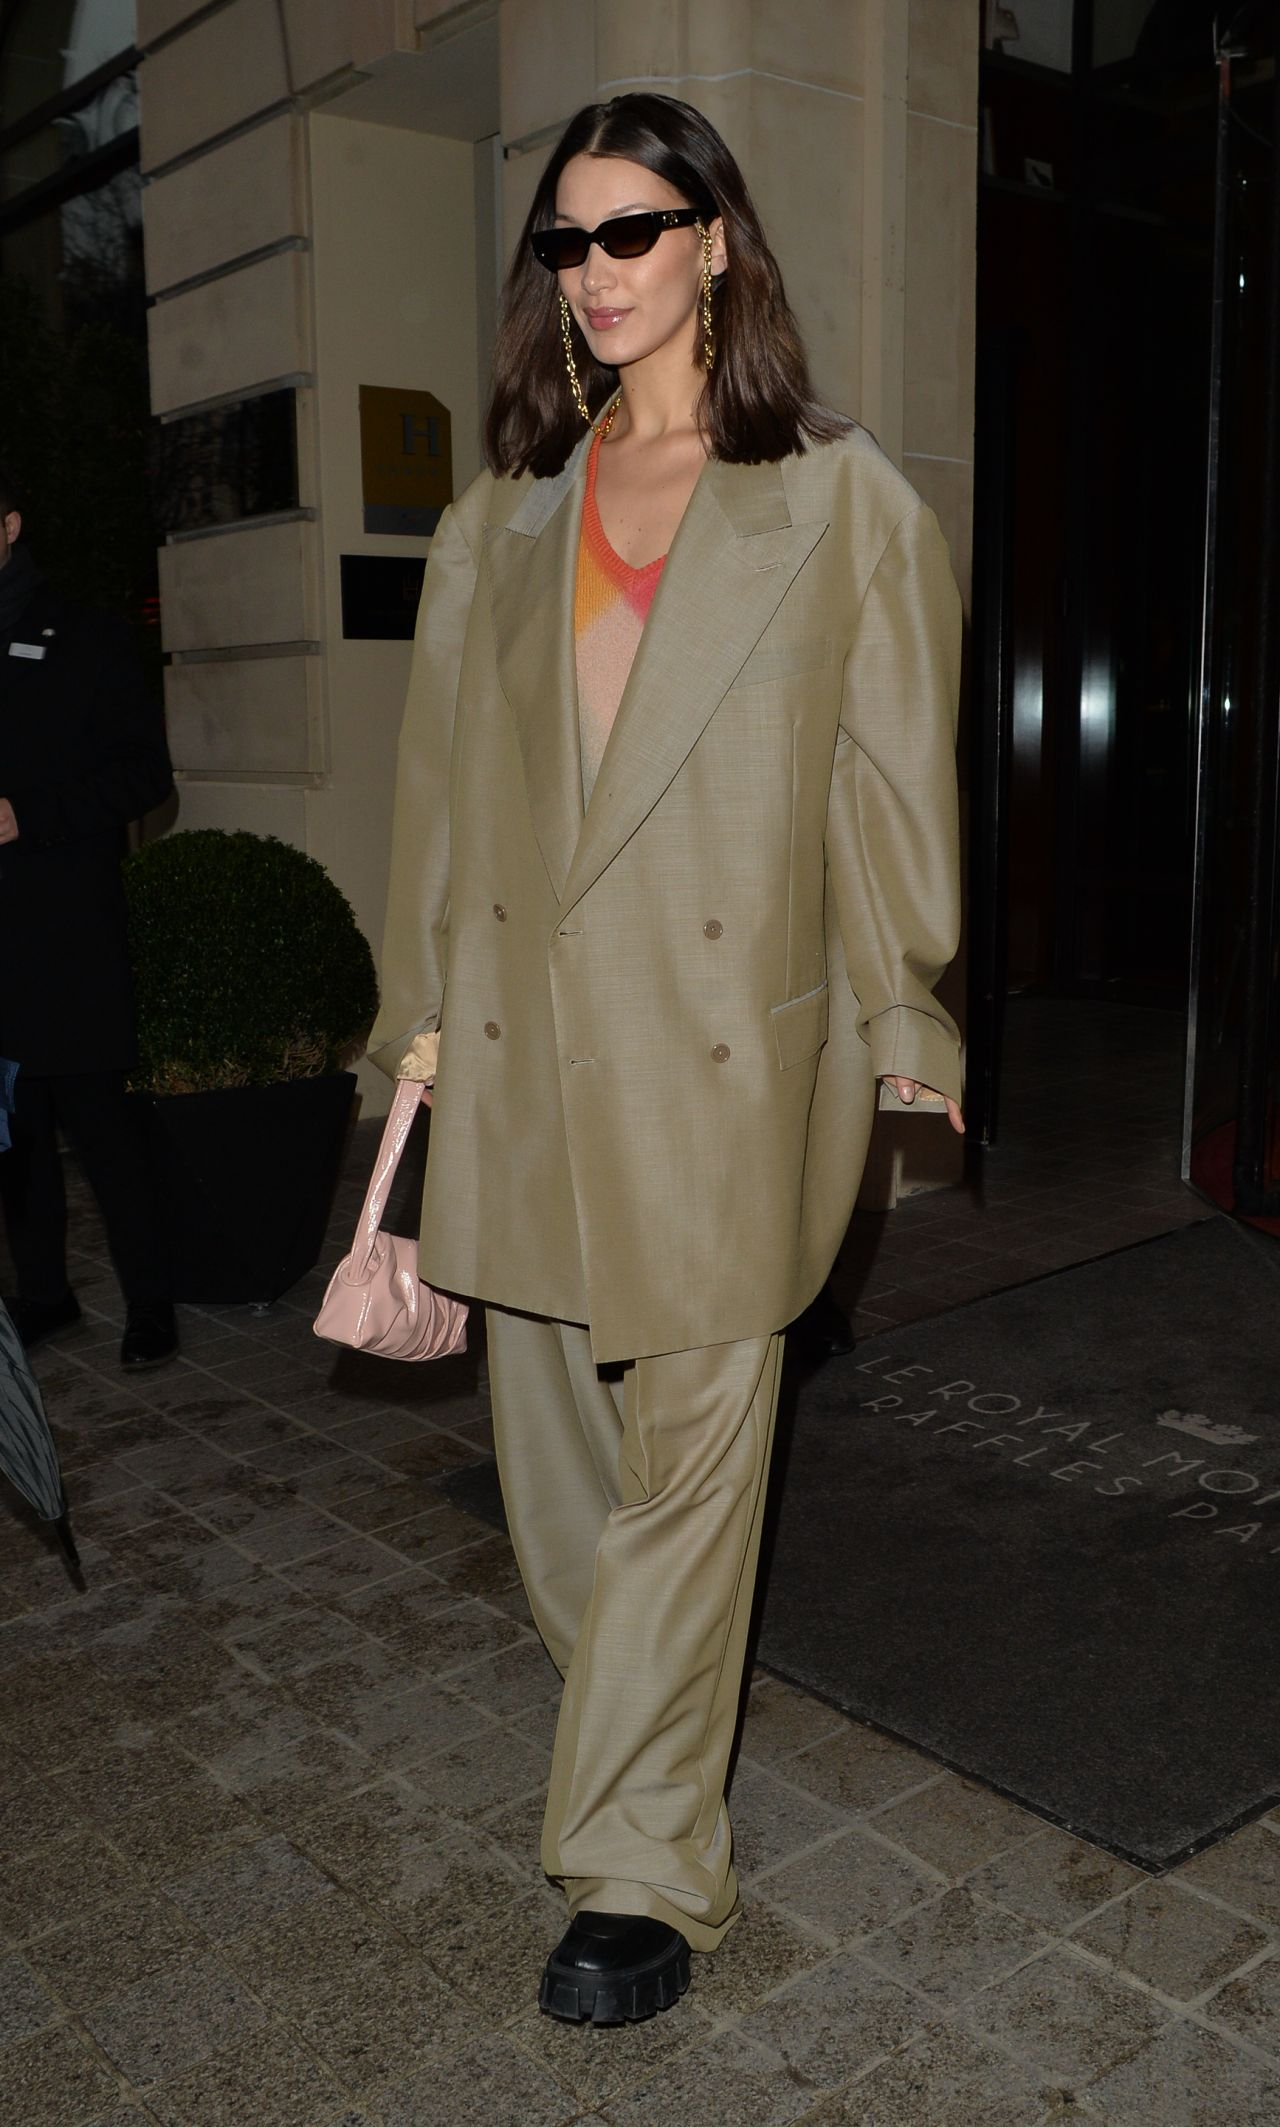 bella-hadid-wears-oversized-suit-leaving-her-hotel-in-paris